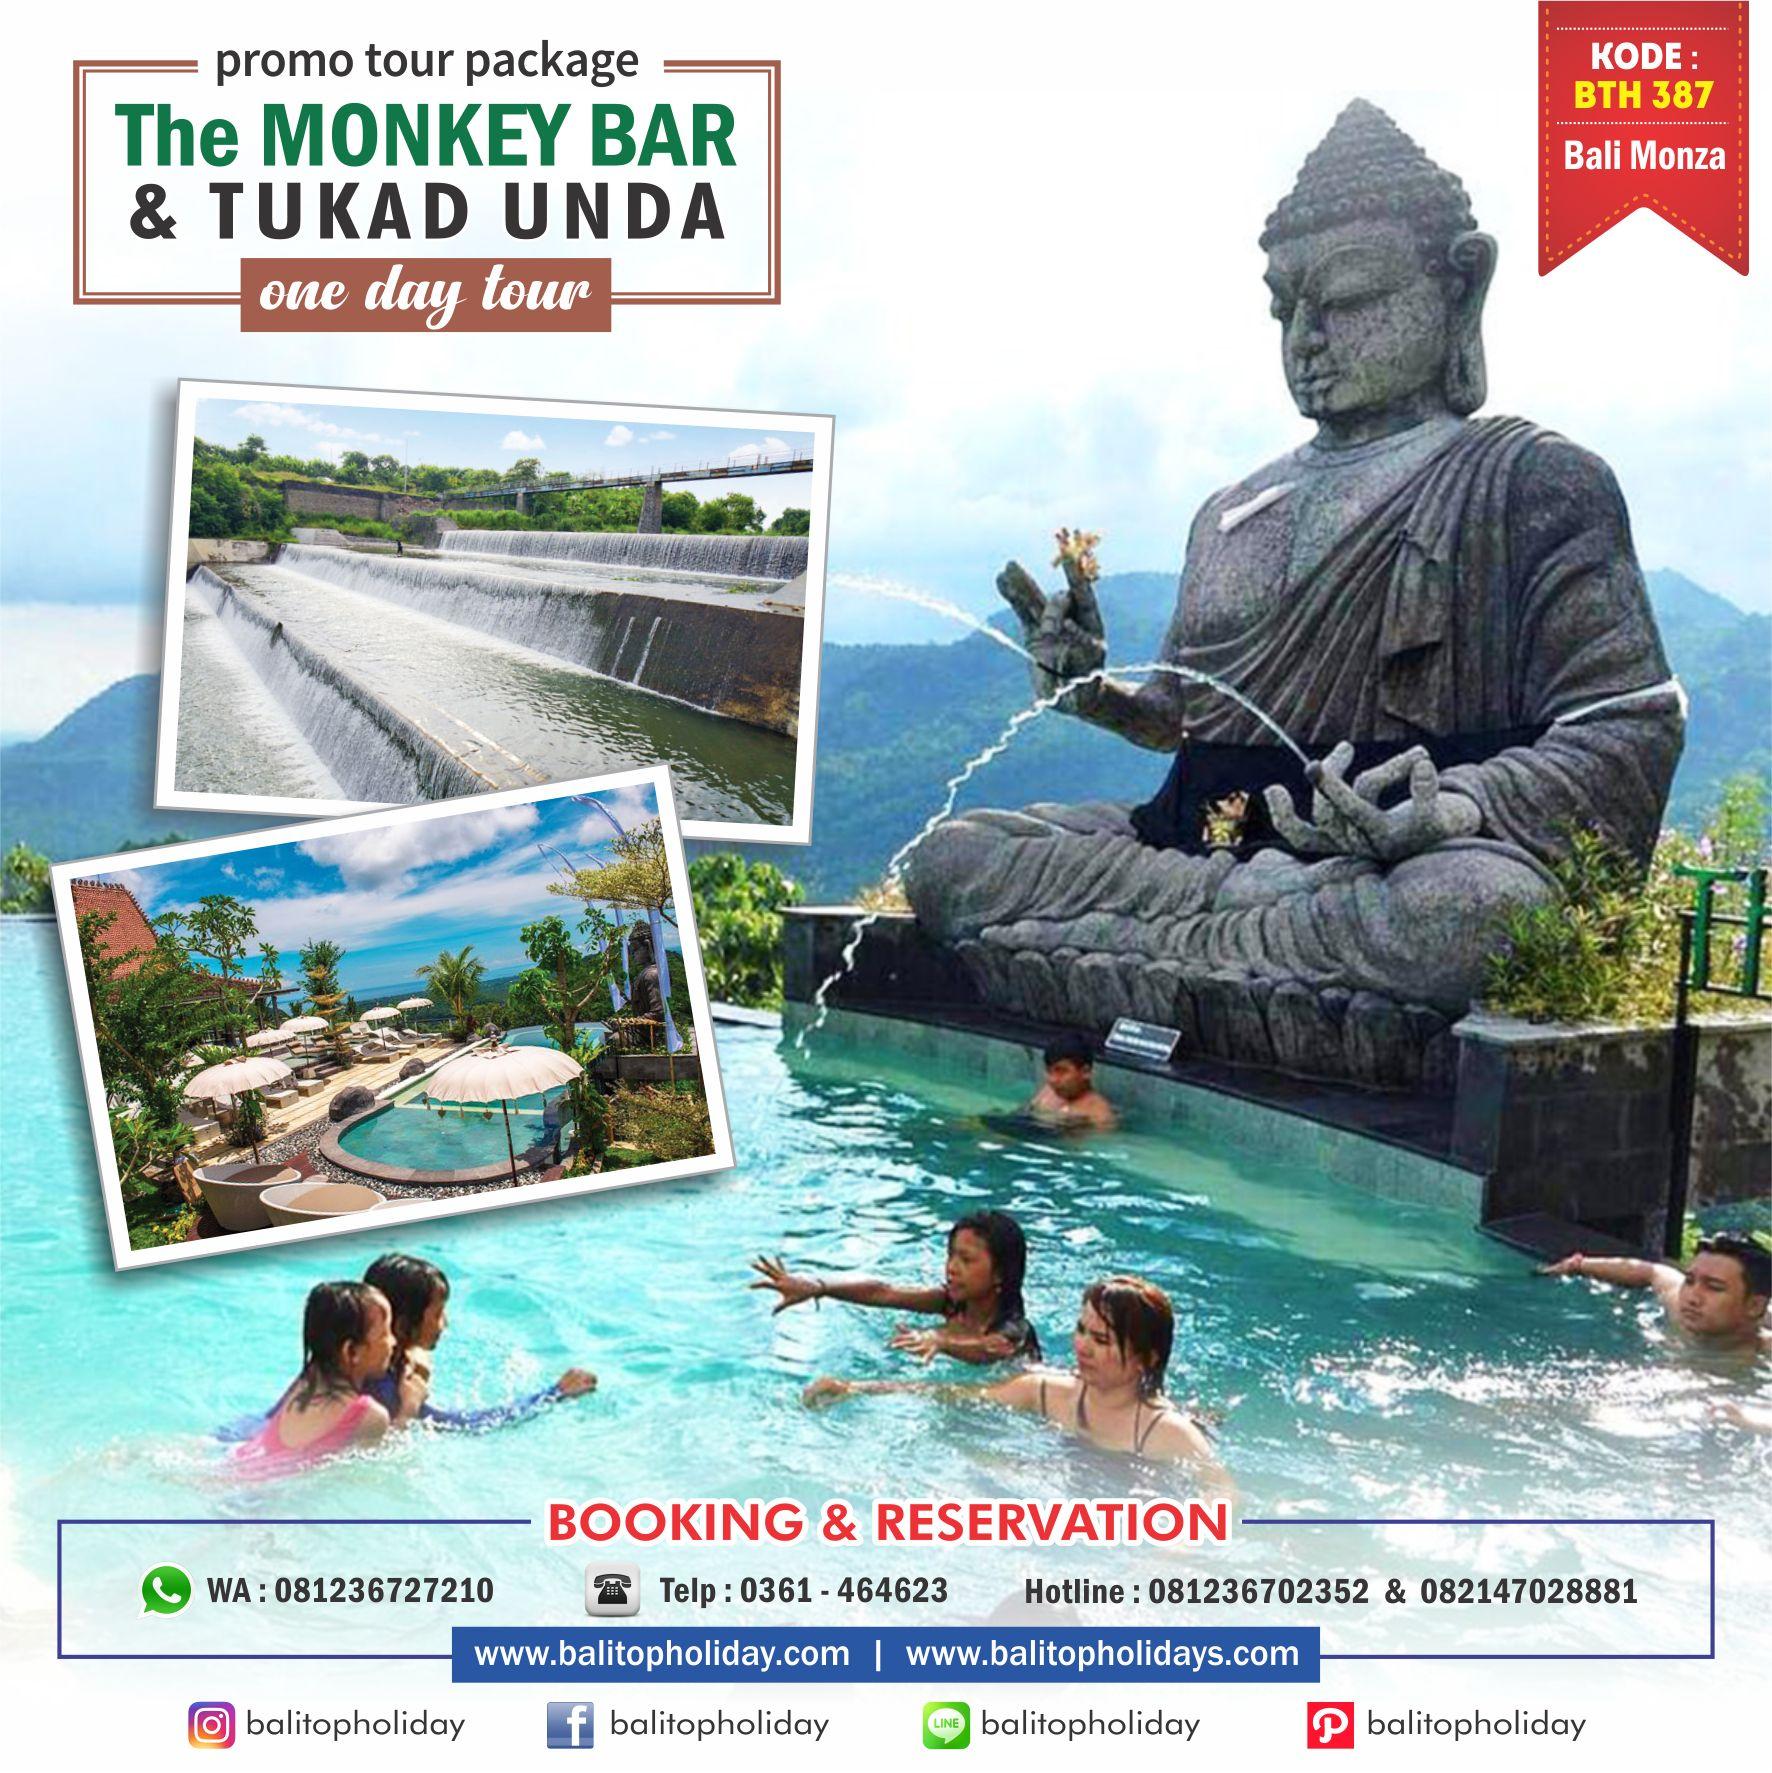 Monkey Bar & Tukad Unda BTH 387 Bali Monza